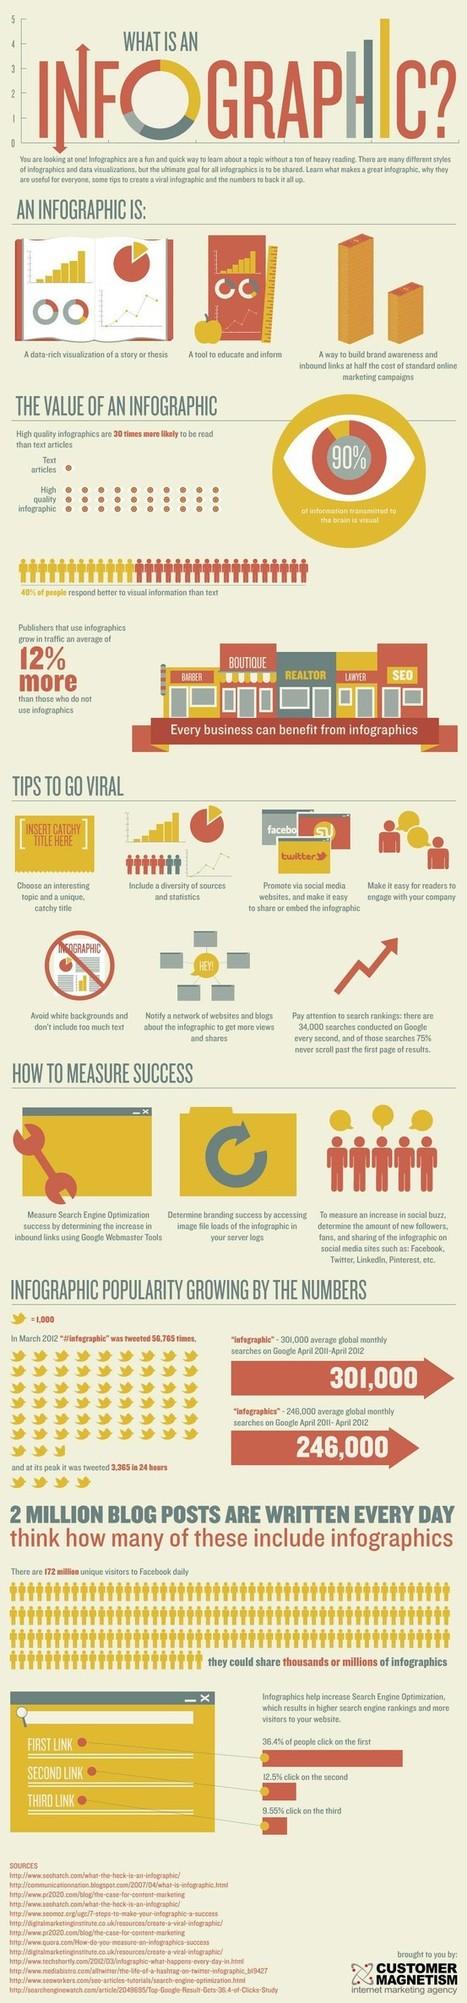 An Infographic about Infographics | Infographics and Social Media | Scoop.it